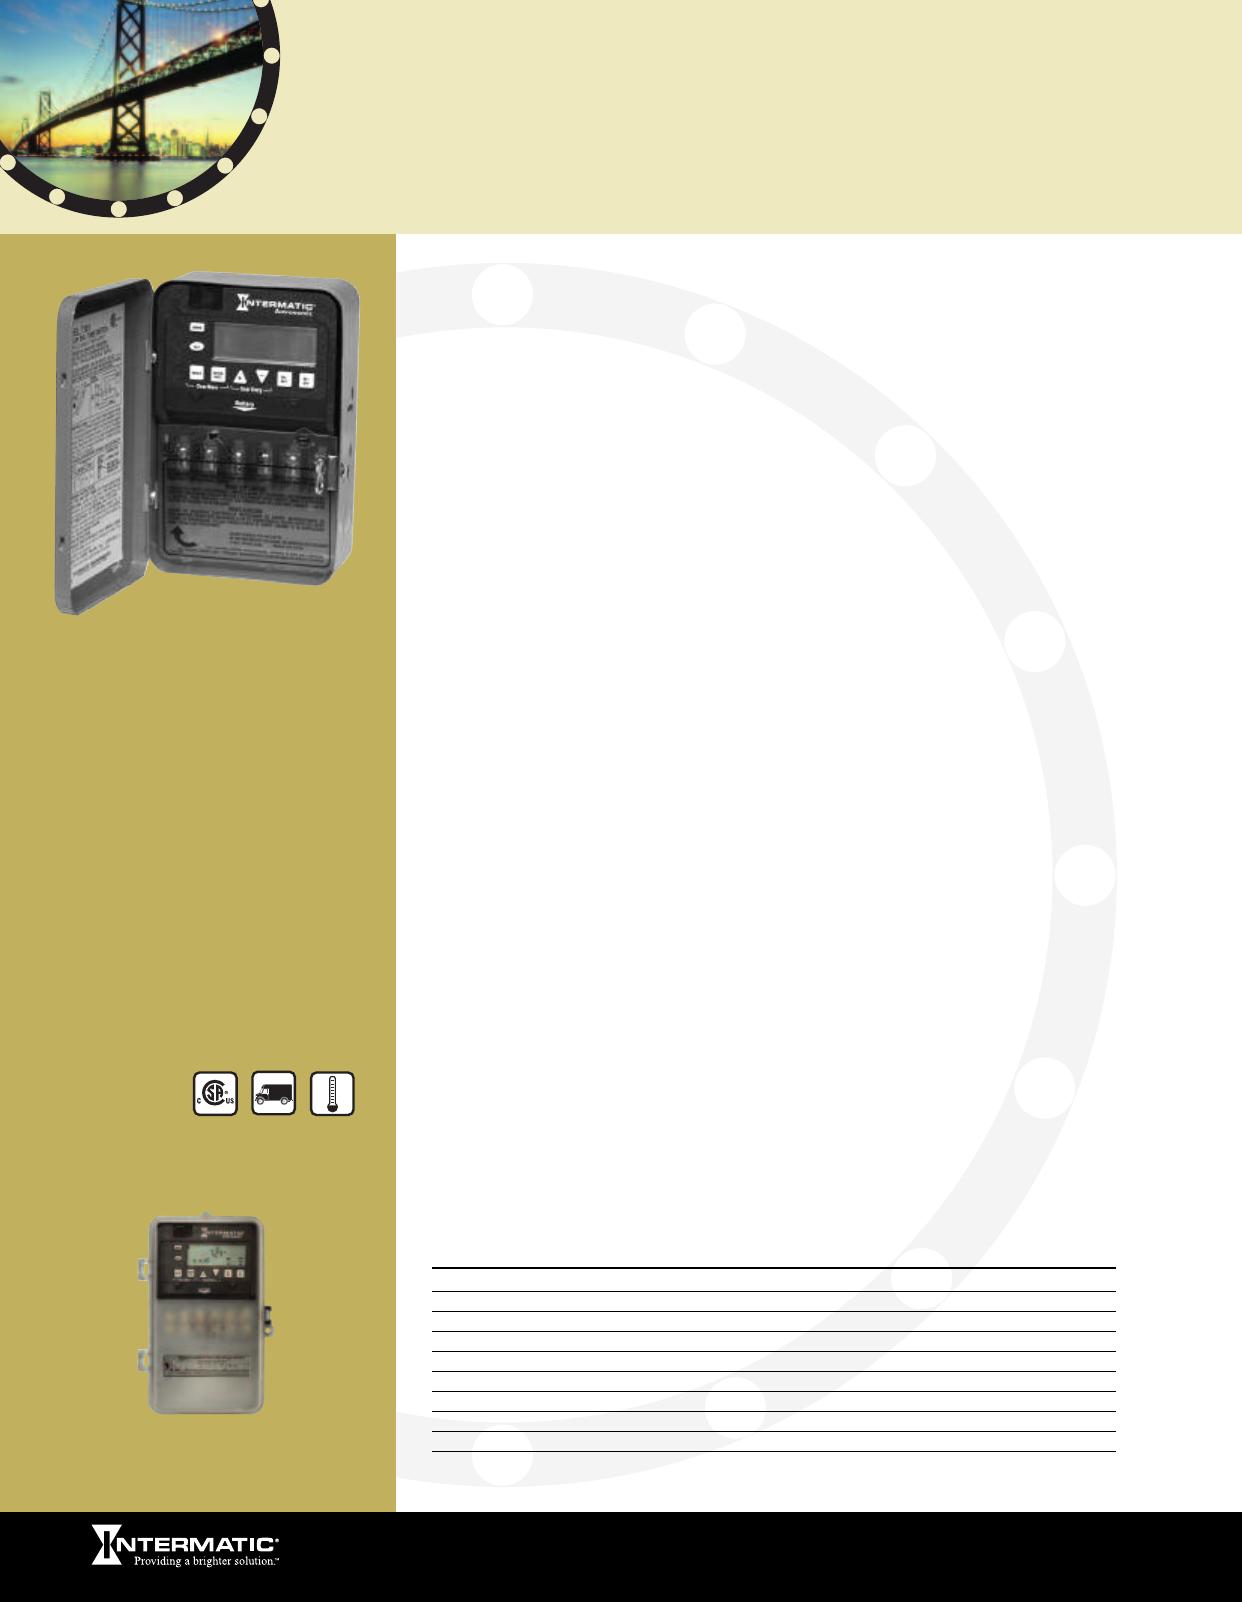 Intermatic General Catalog 121623 Dual Time Clock Wiring Diagram Weatherproof Energy Controls Professional Lighting Pool Spa Surge Protection Consumer